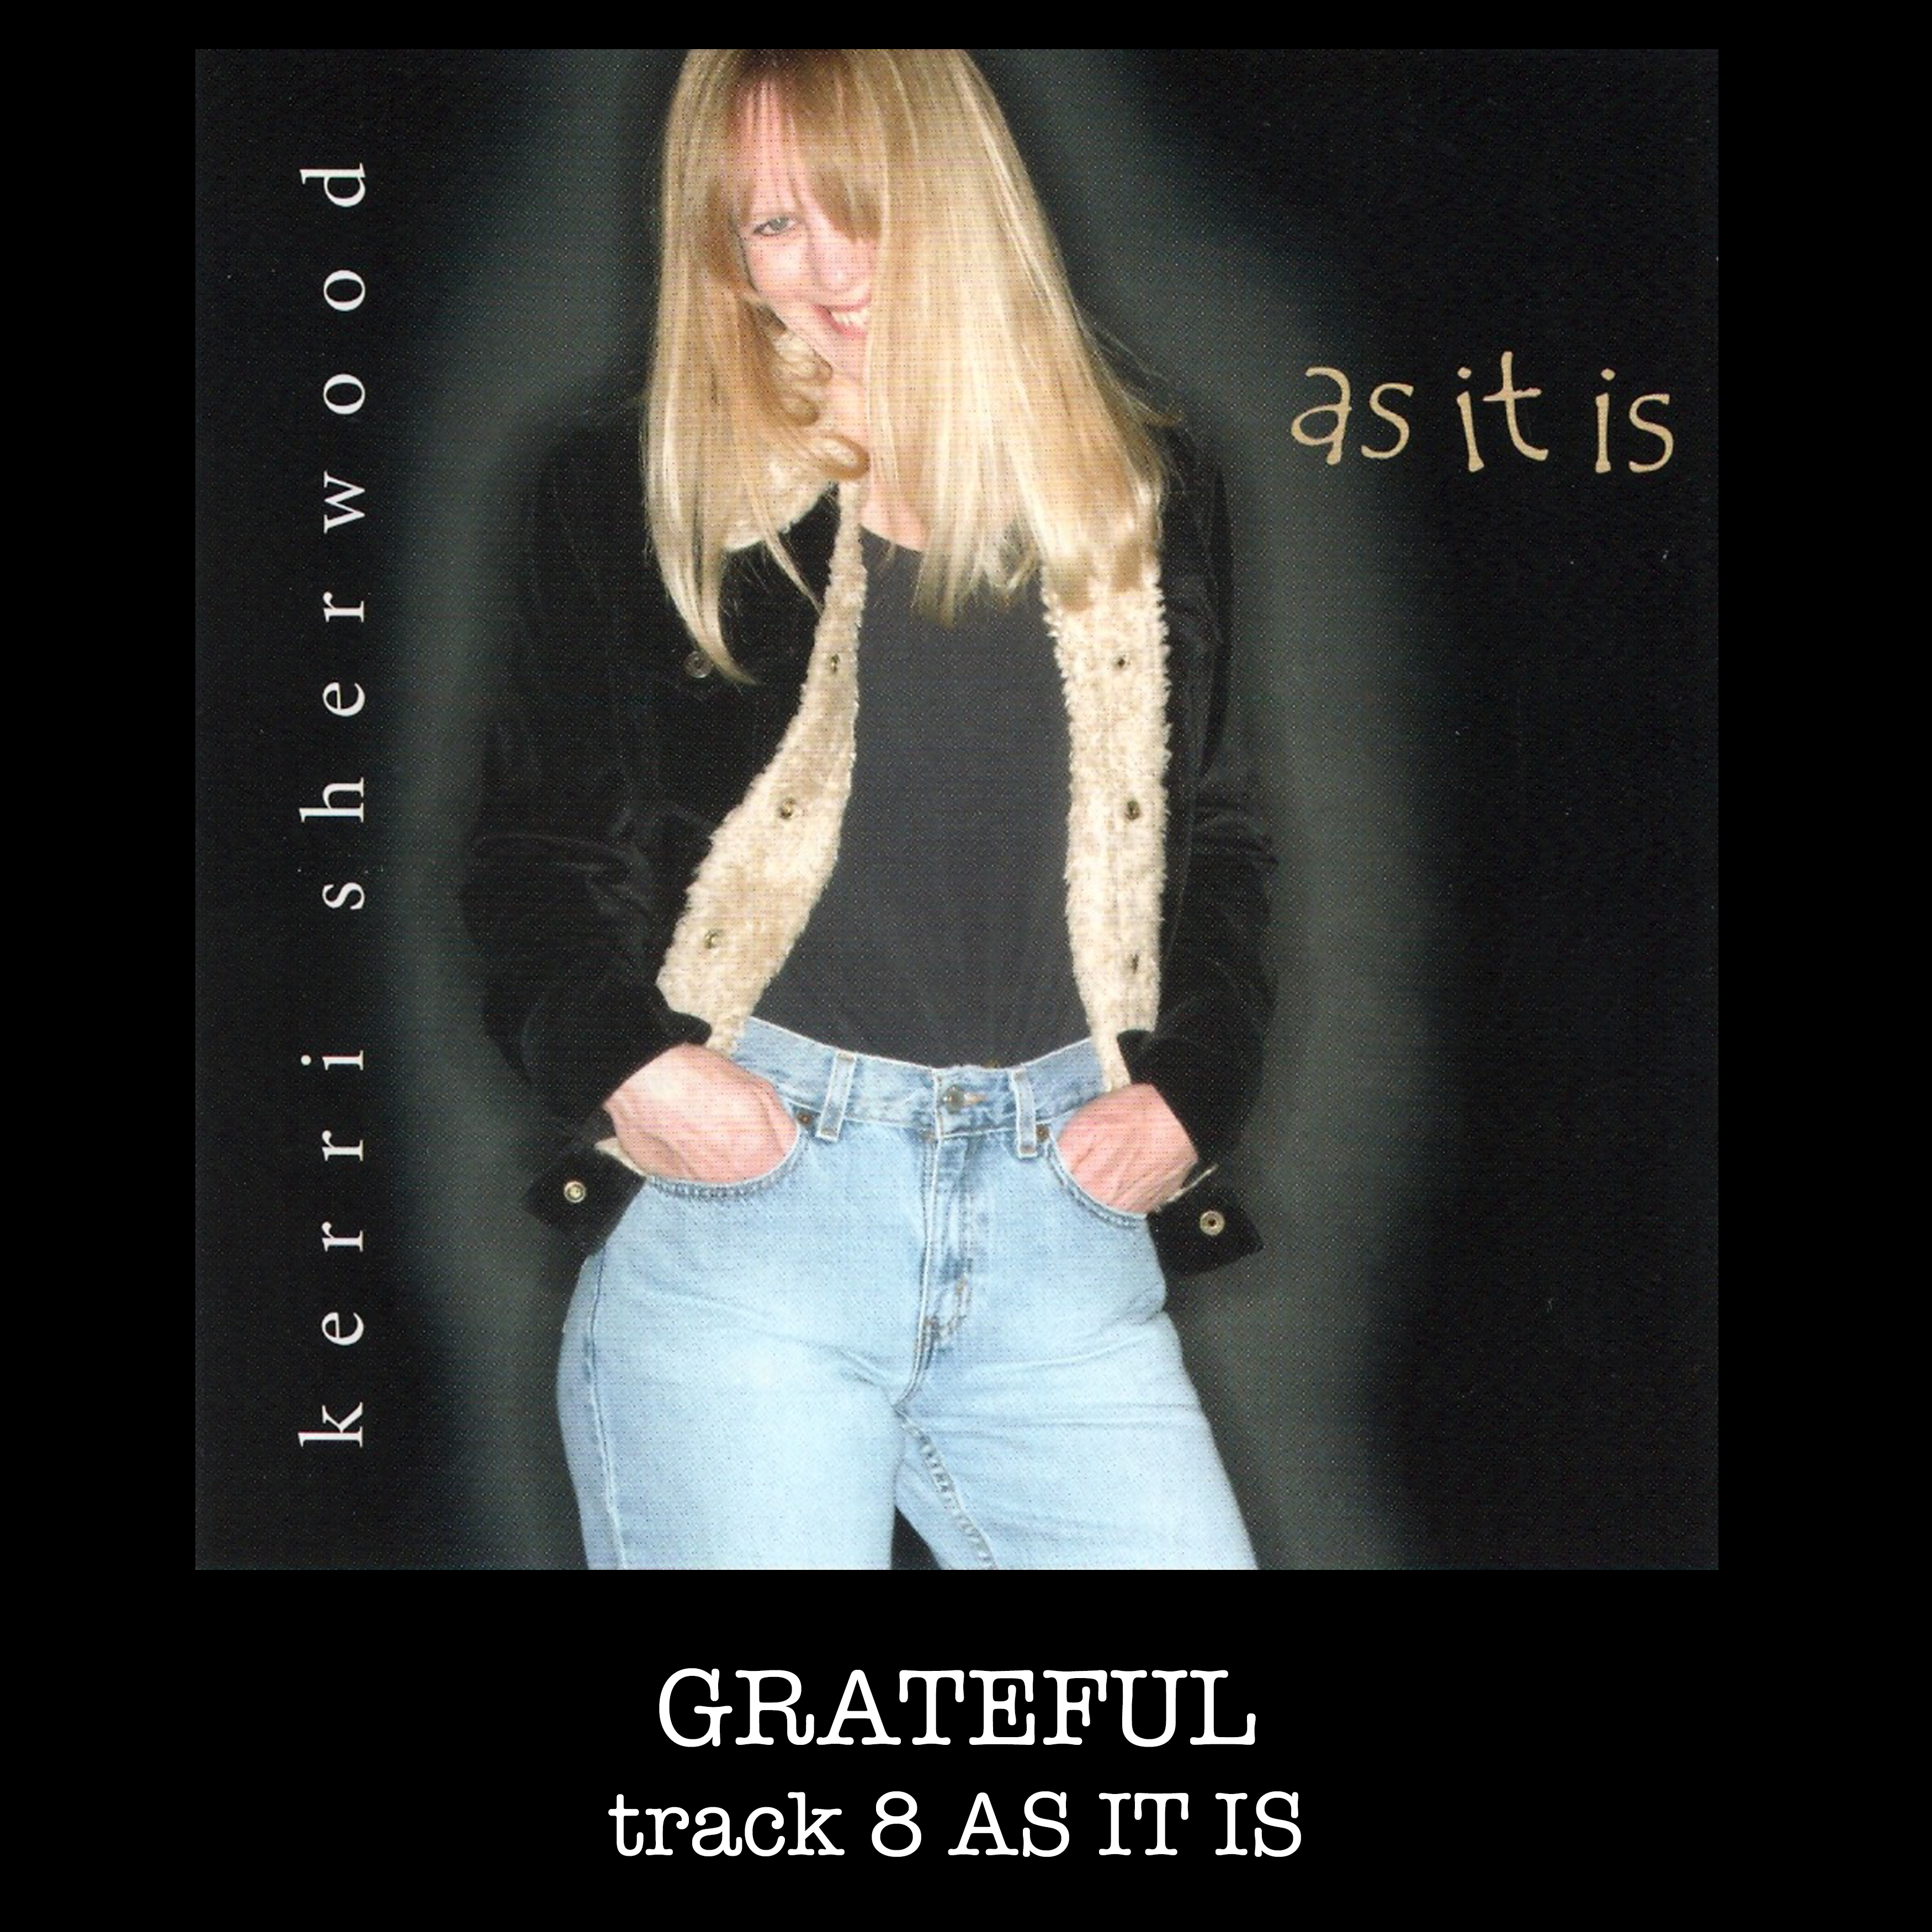 grateful song box copy